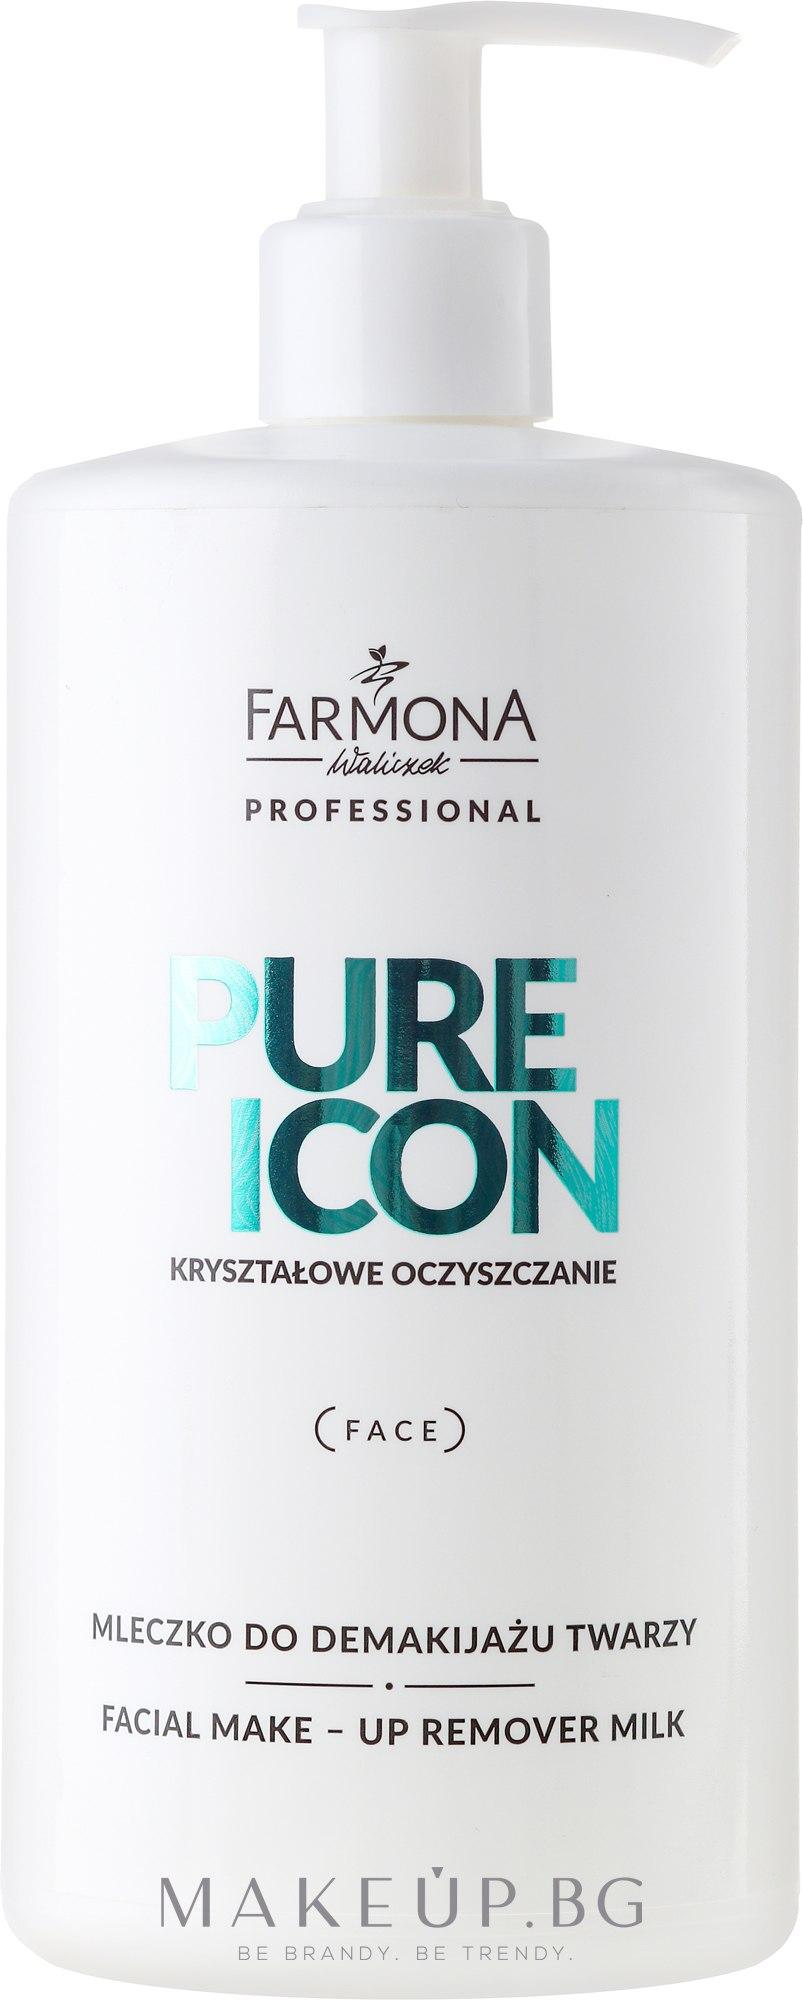 Почистващо мляко за грим - Farmona Professional Pure Icon Crystal — снимка 500 ml